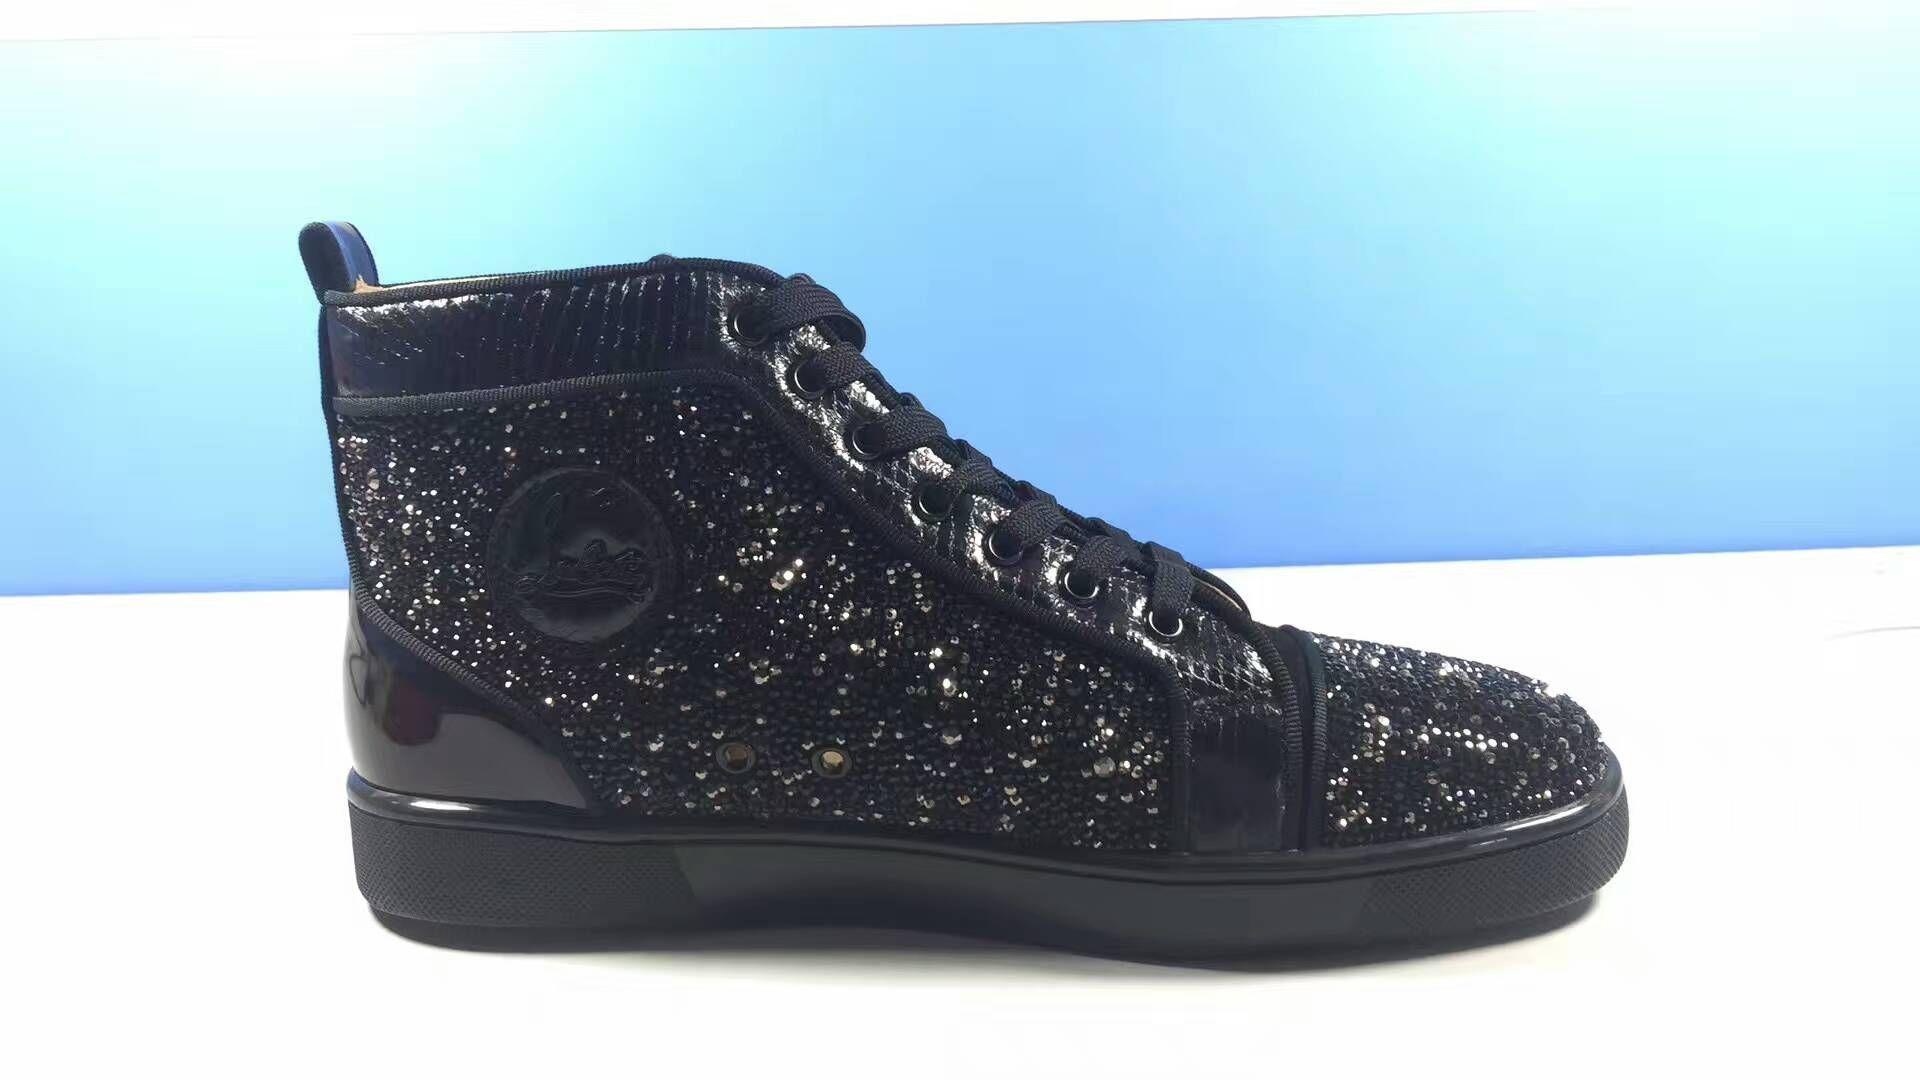 7b03fc0b714 Christian Louboutin Rantus Glitter Black High Sneakers | shoes i ...